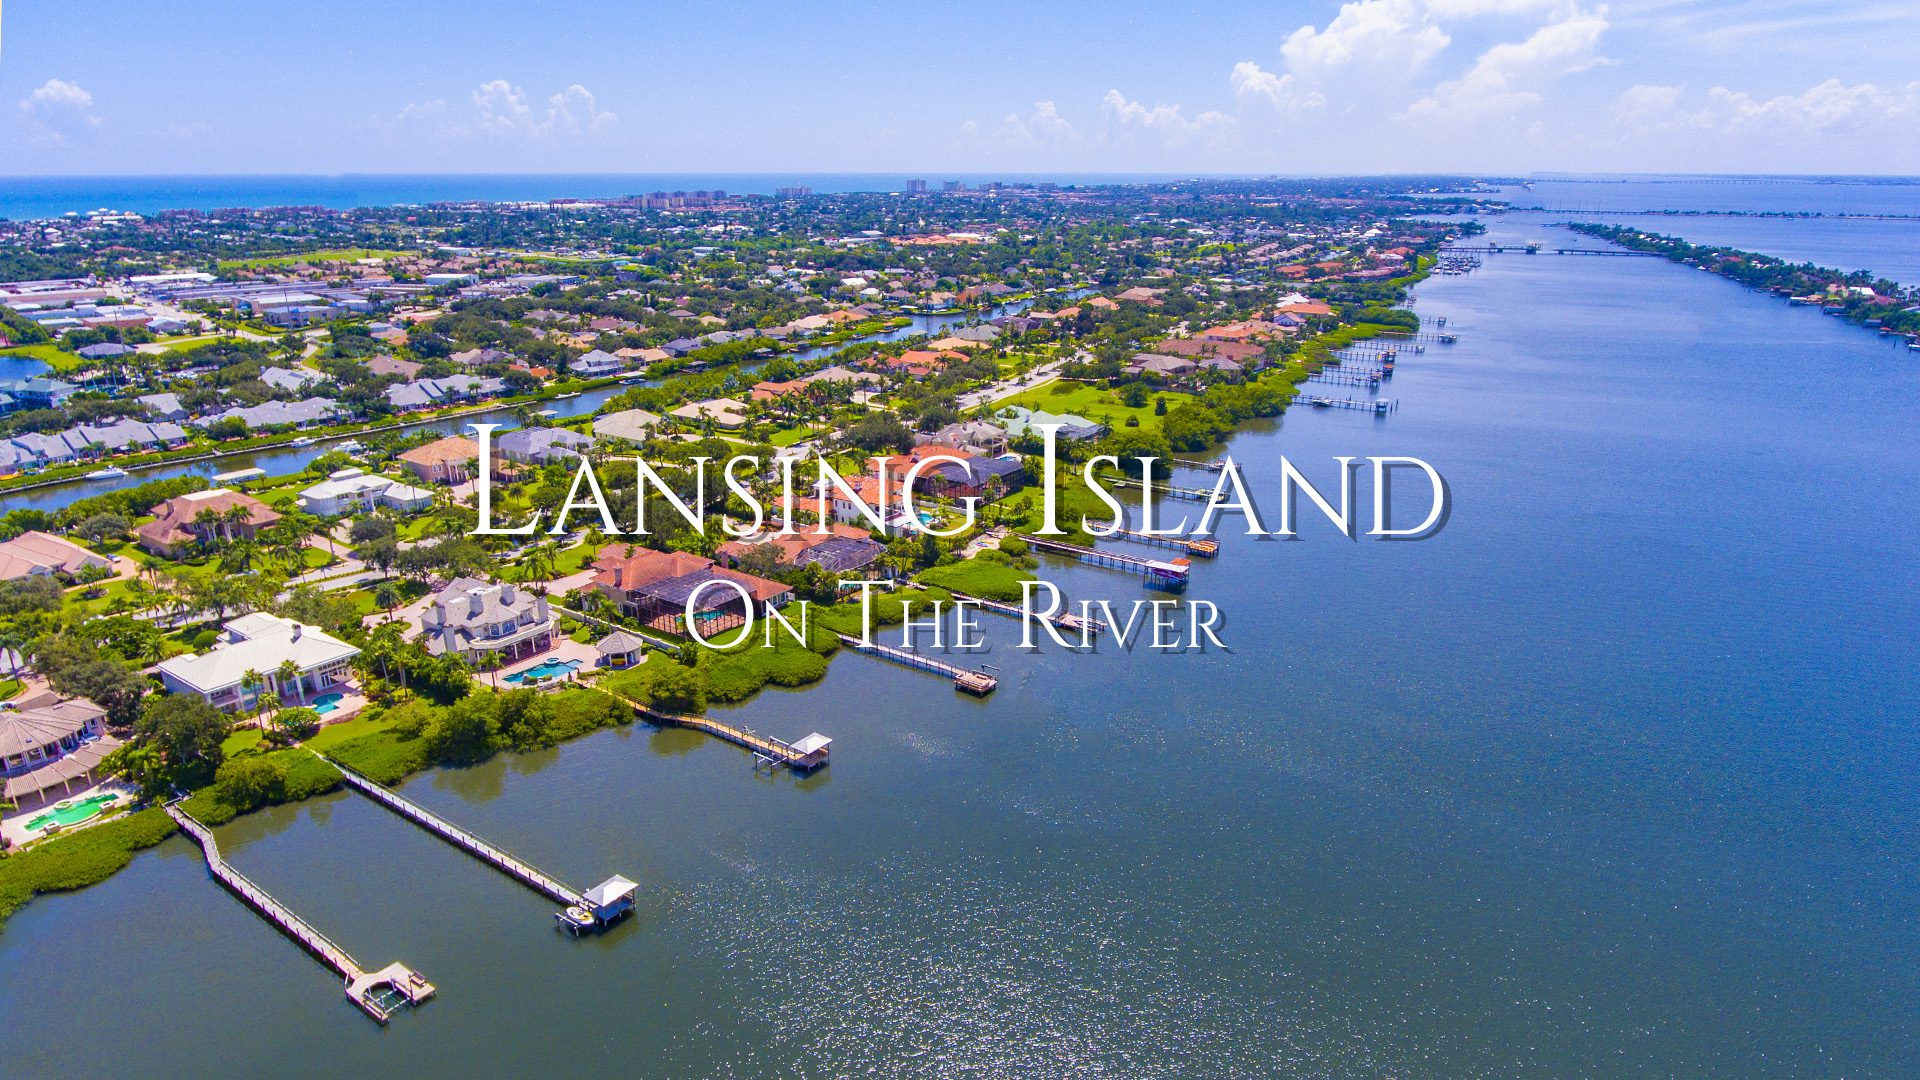 lansing island real estate listing expert Ryan SOlberg